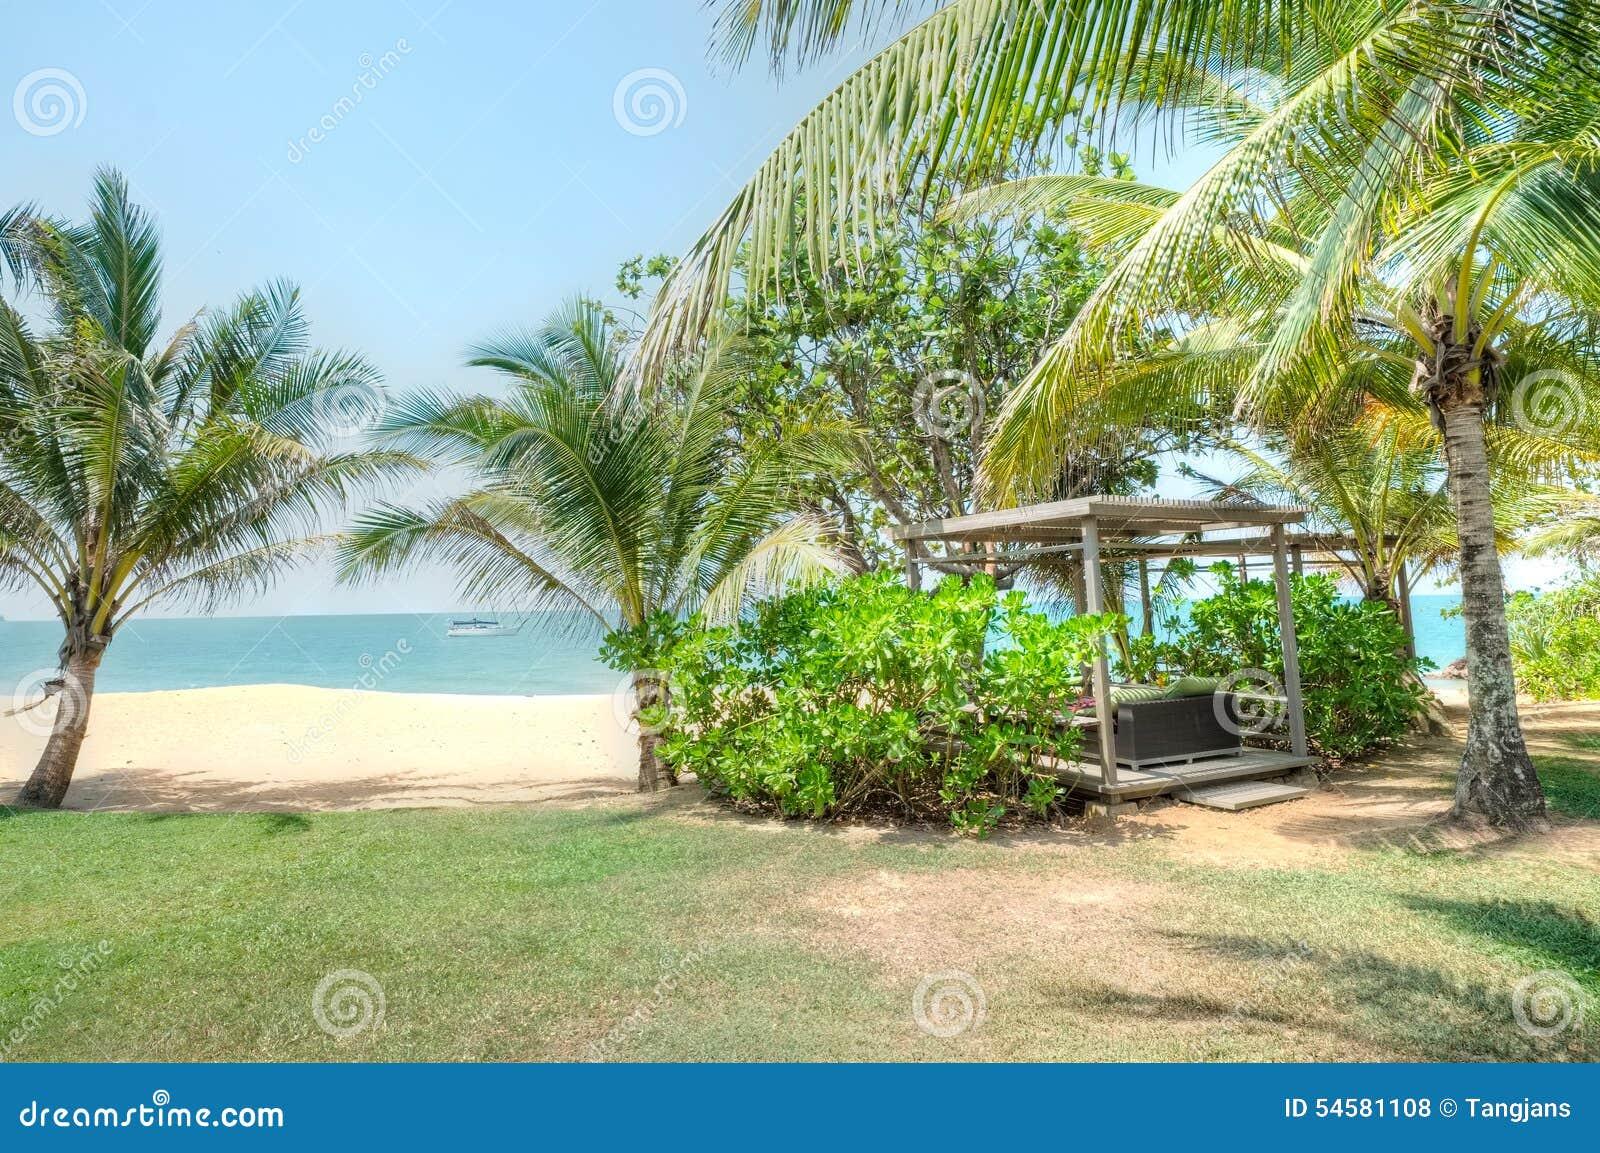 Cherating Malaysia  city photo : Cherating Beach, Kuantan, Malaysia Stock Photo Image: 54581108